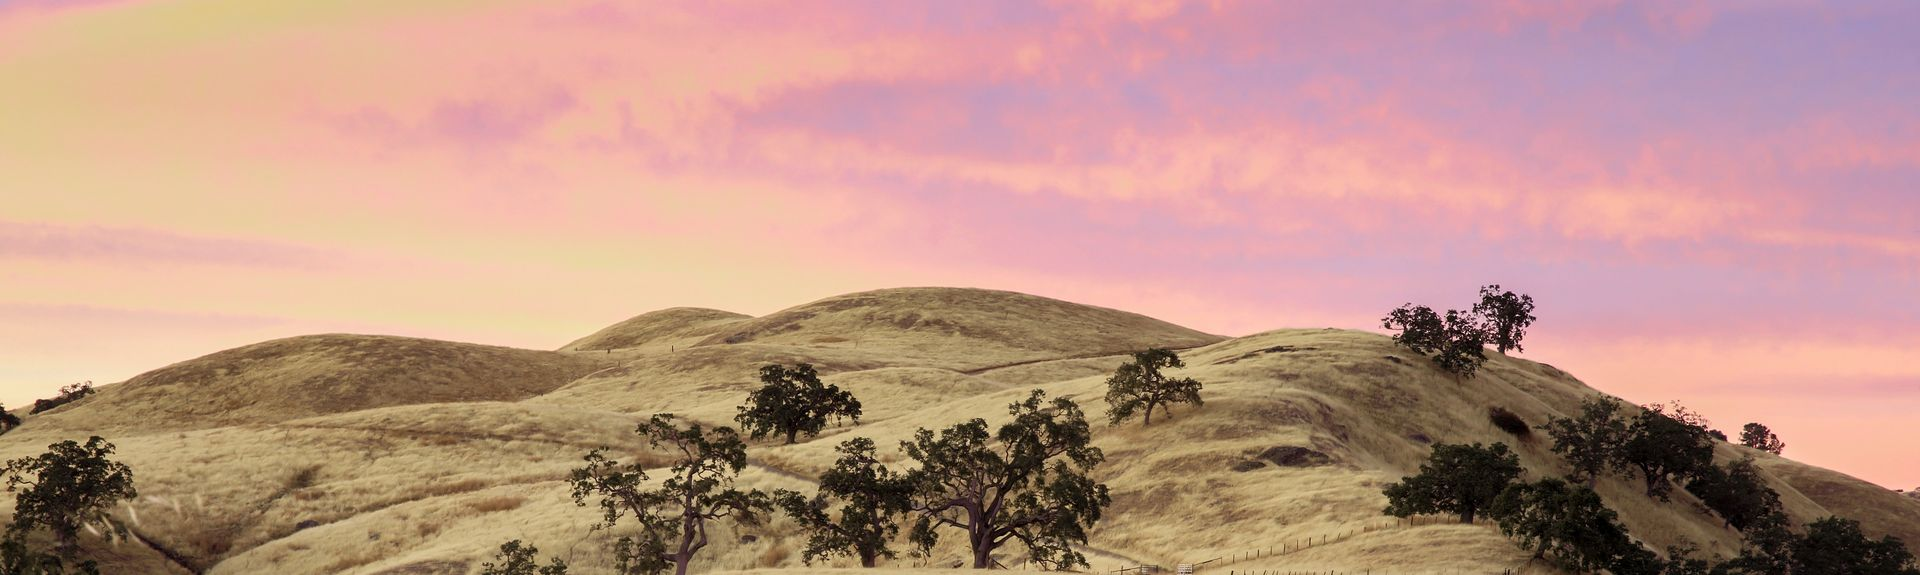 Santa Clara, California, United States of America